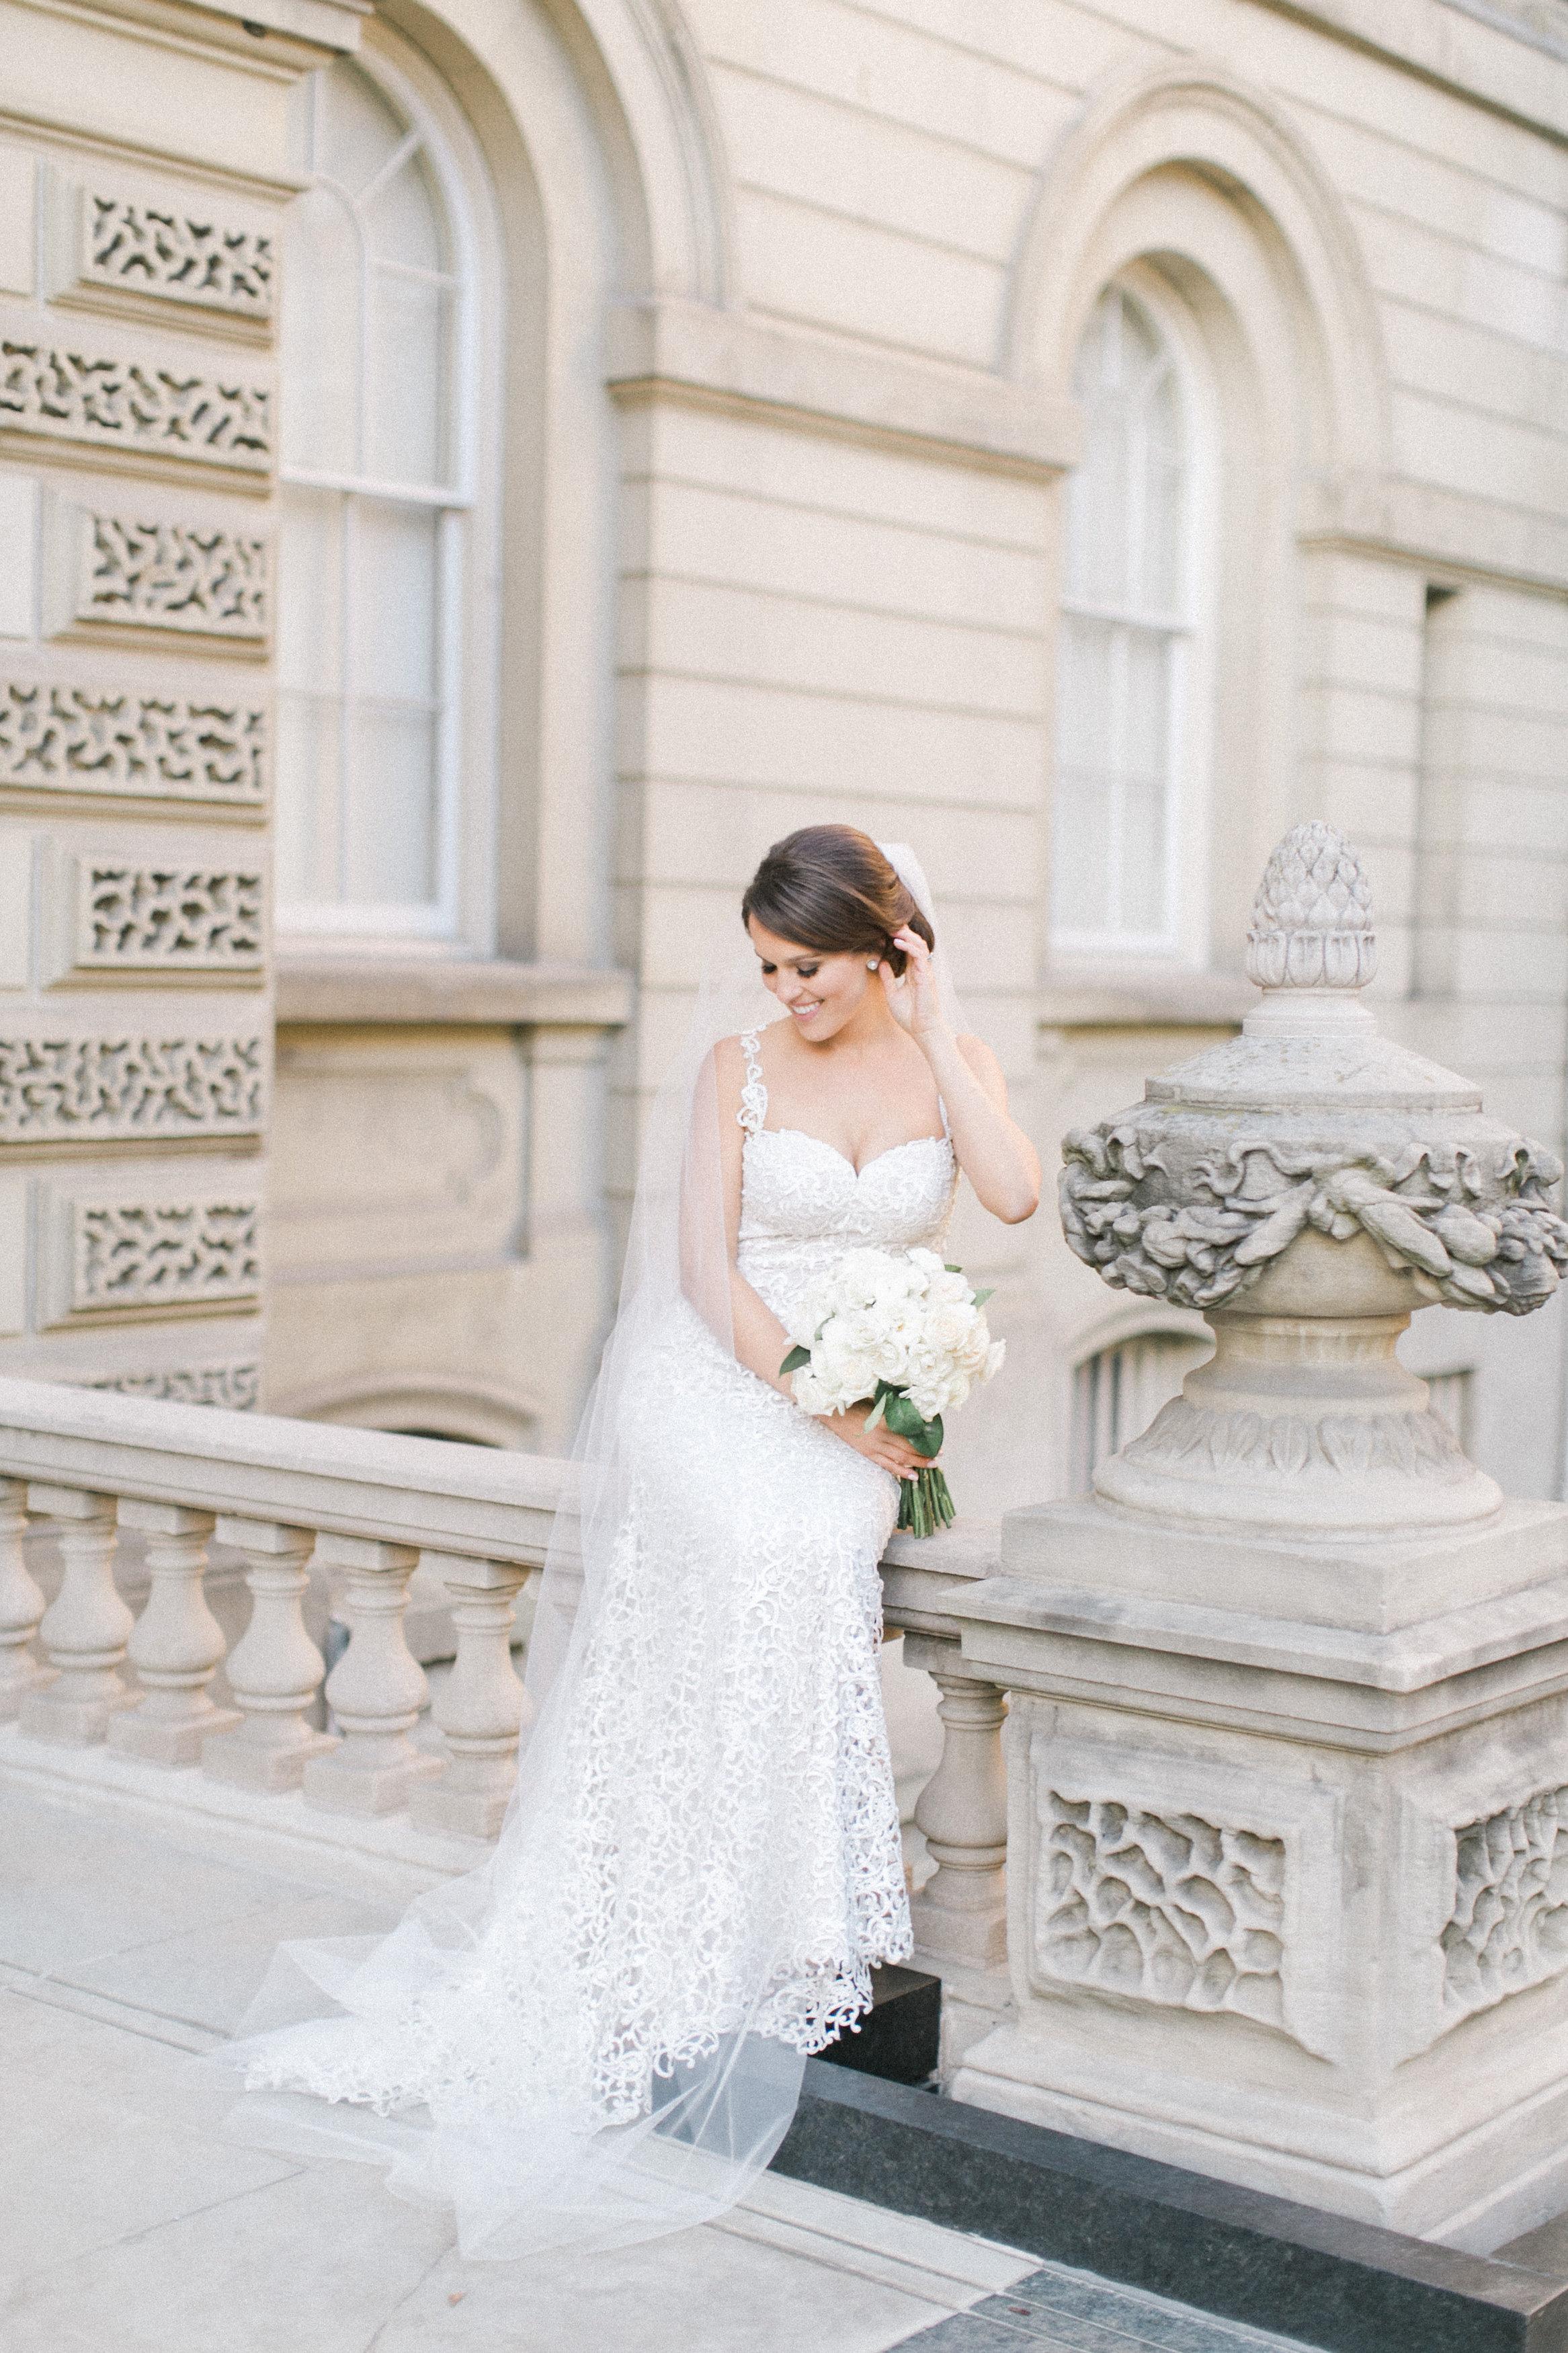 arcadian-court-loft-toronto-wedding-photographer-richelle-hunter-cassandra-mark-117.jpg